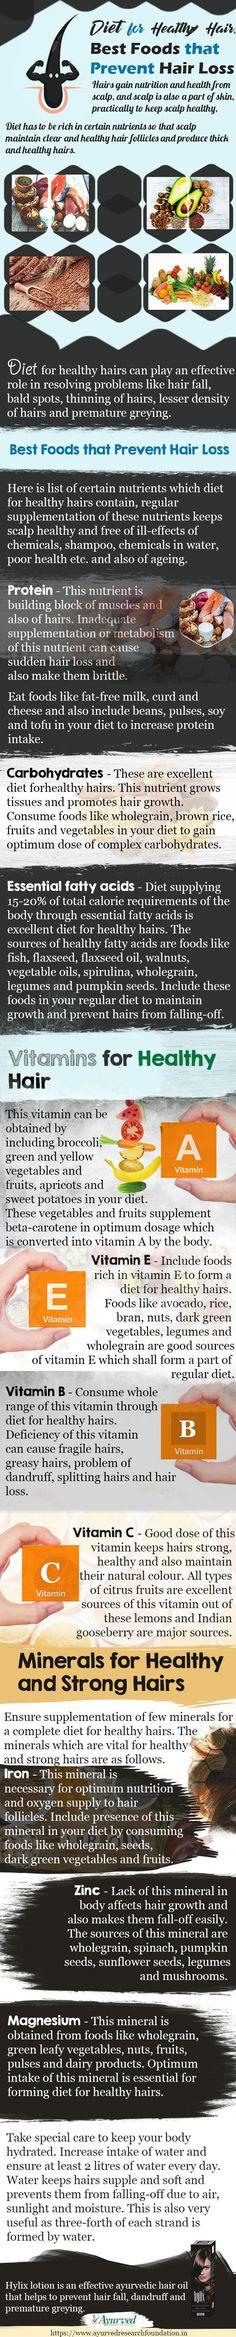 QuotBest Essential Oils for Skin Carequot Checklist t